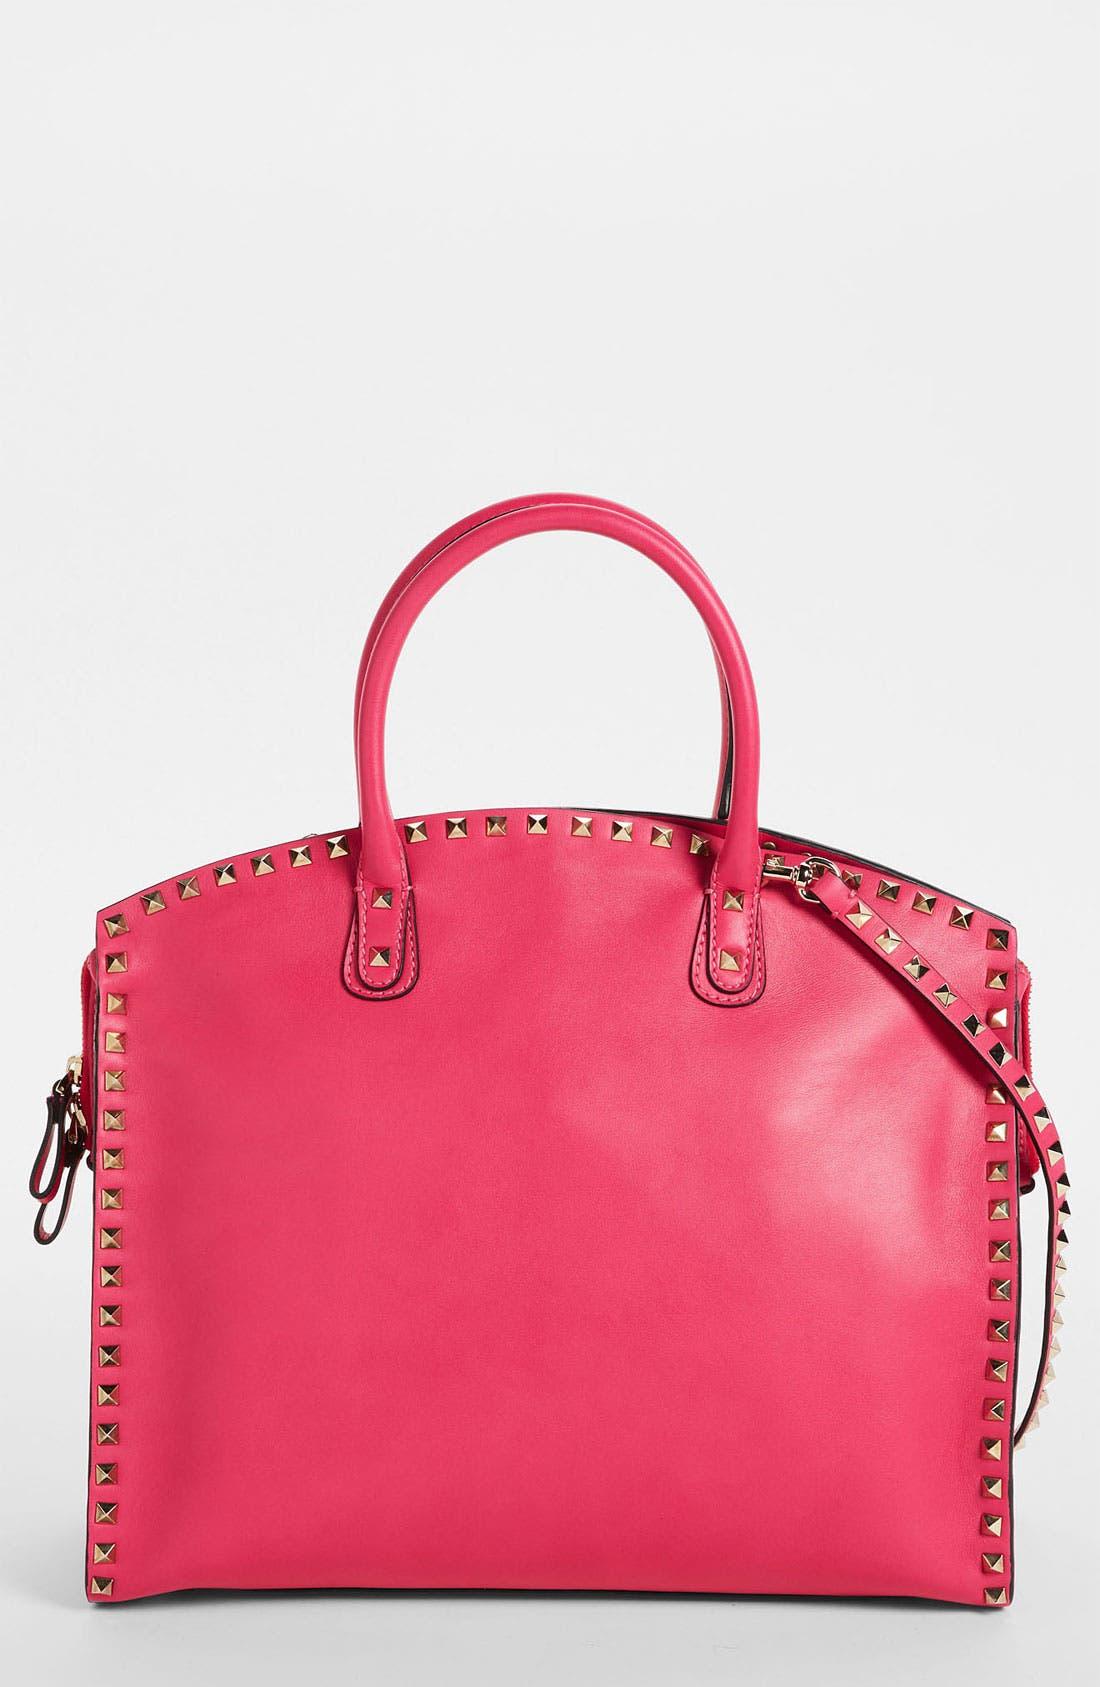 Alternate Image 1 Selected - Valentino 'Rockstud' Leather Dome Satchel